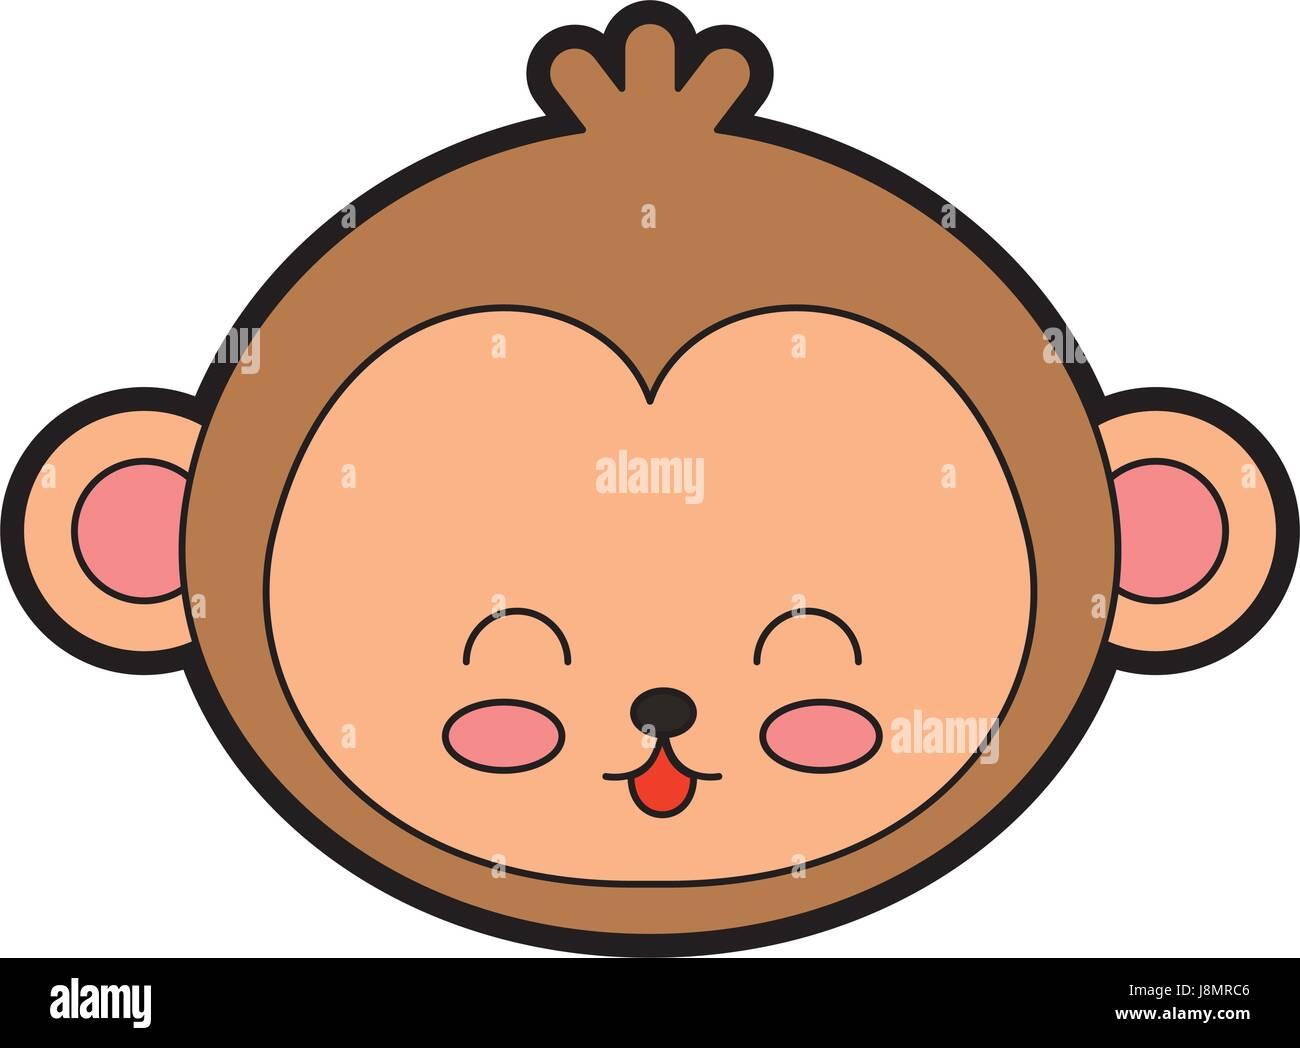 Cute Monkey Face Cartoon Stock Vector Image Art Alamy